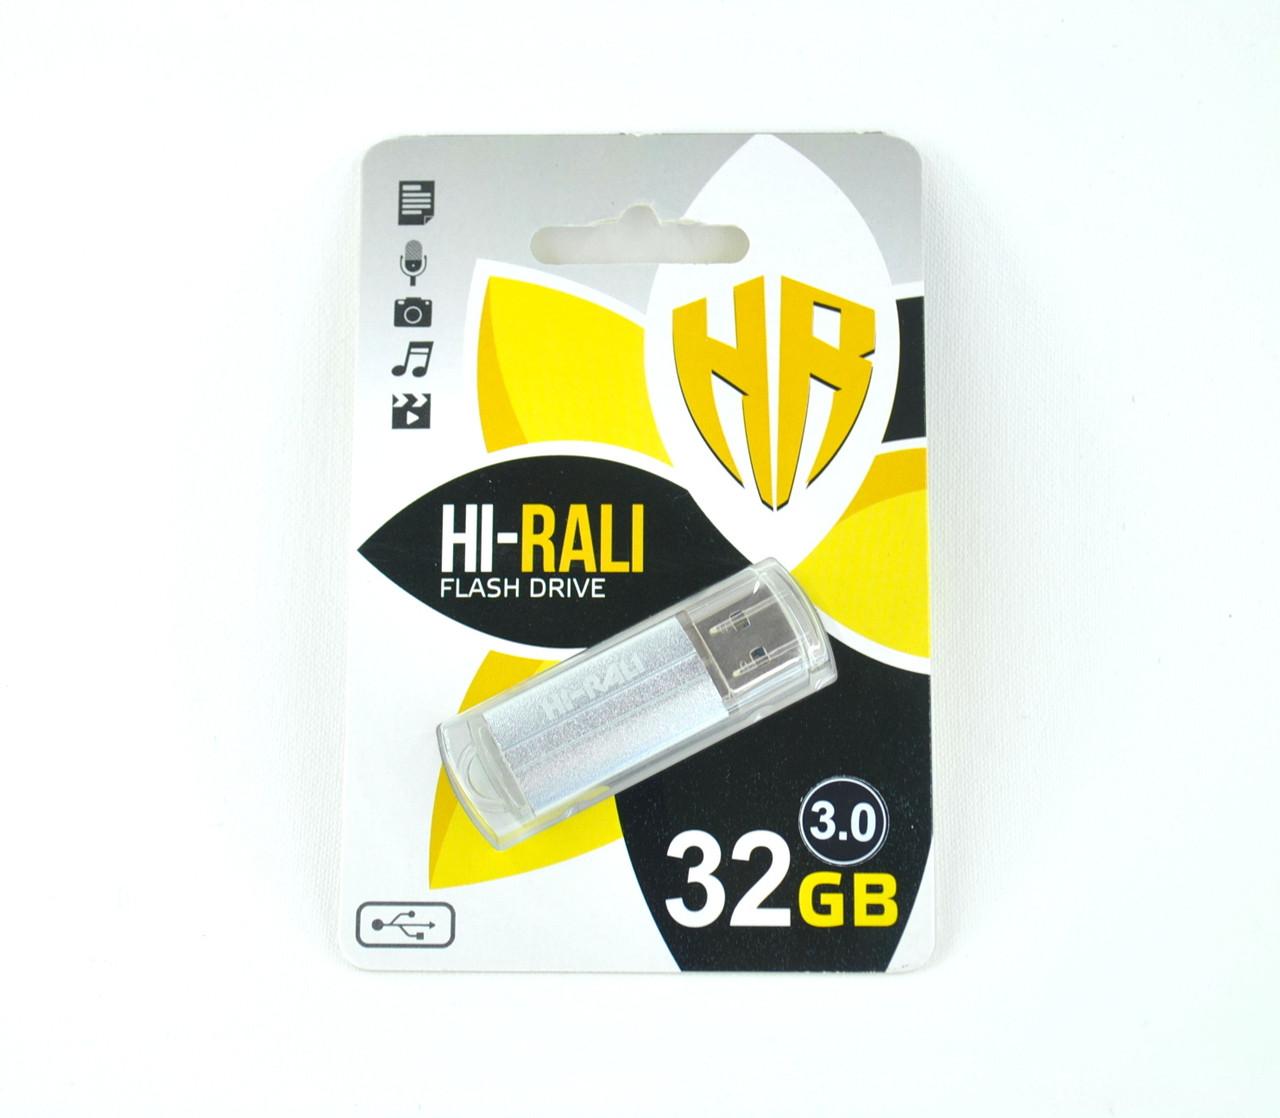 Флеш-накопитель Usb 3.0 32Gb Hi-Rali Corsair series Silver